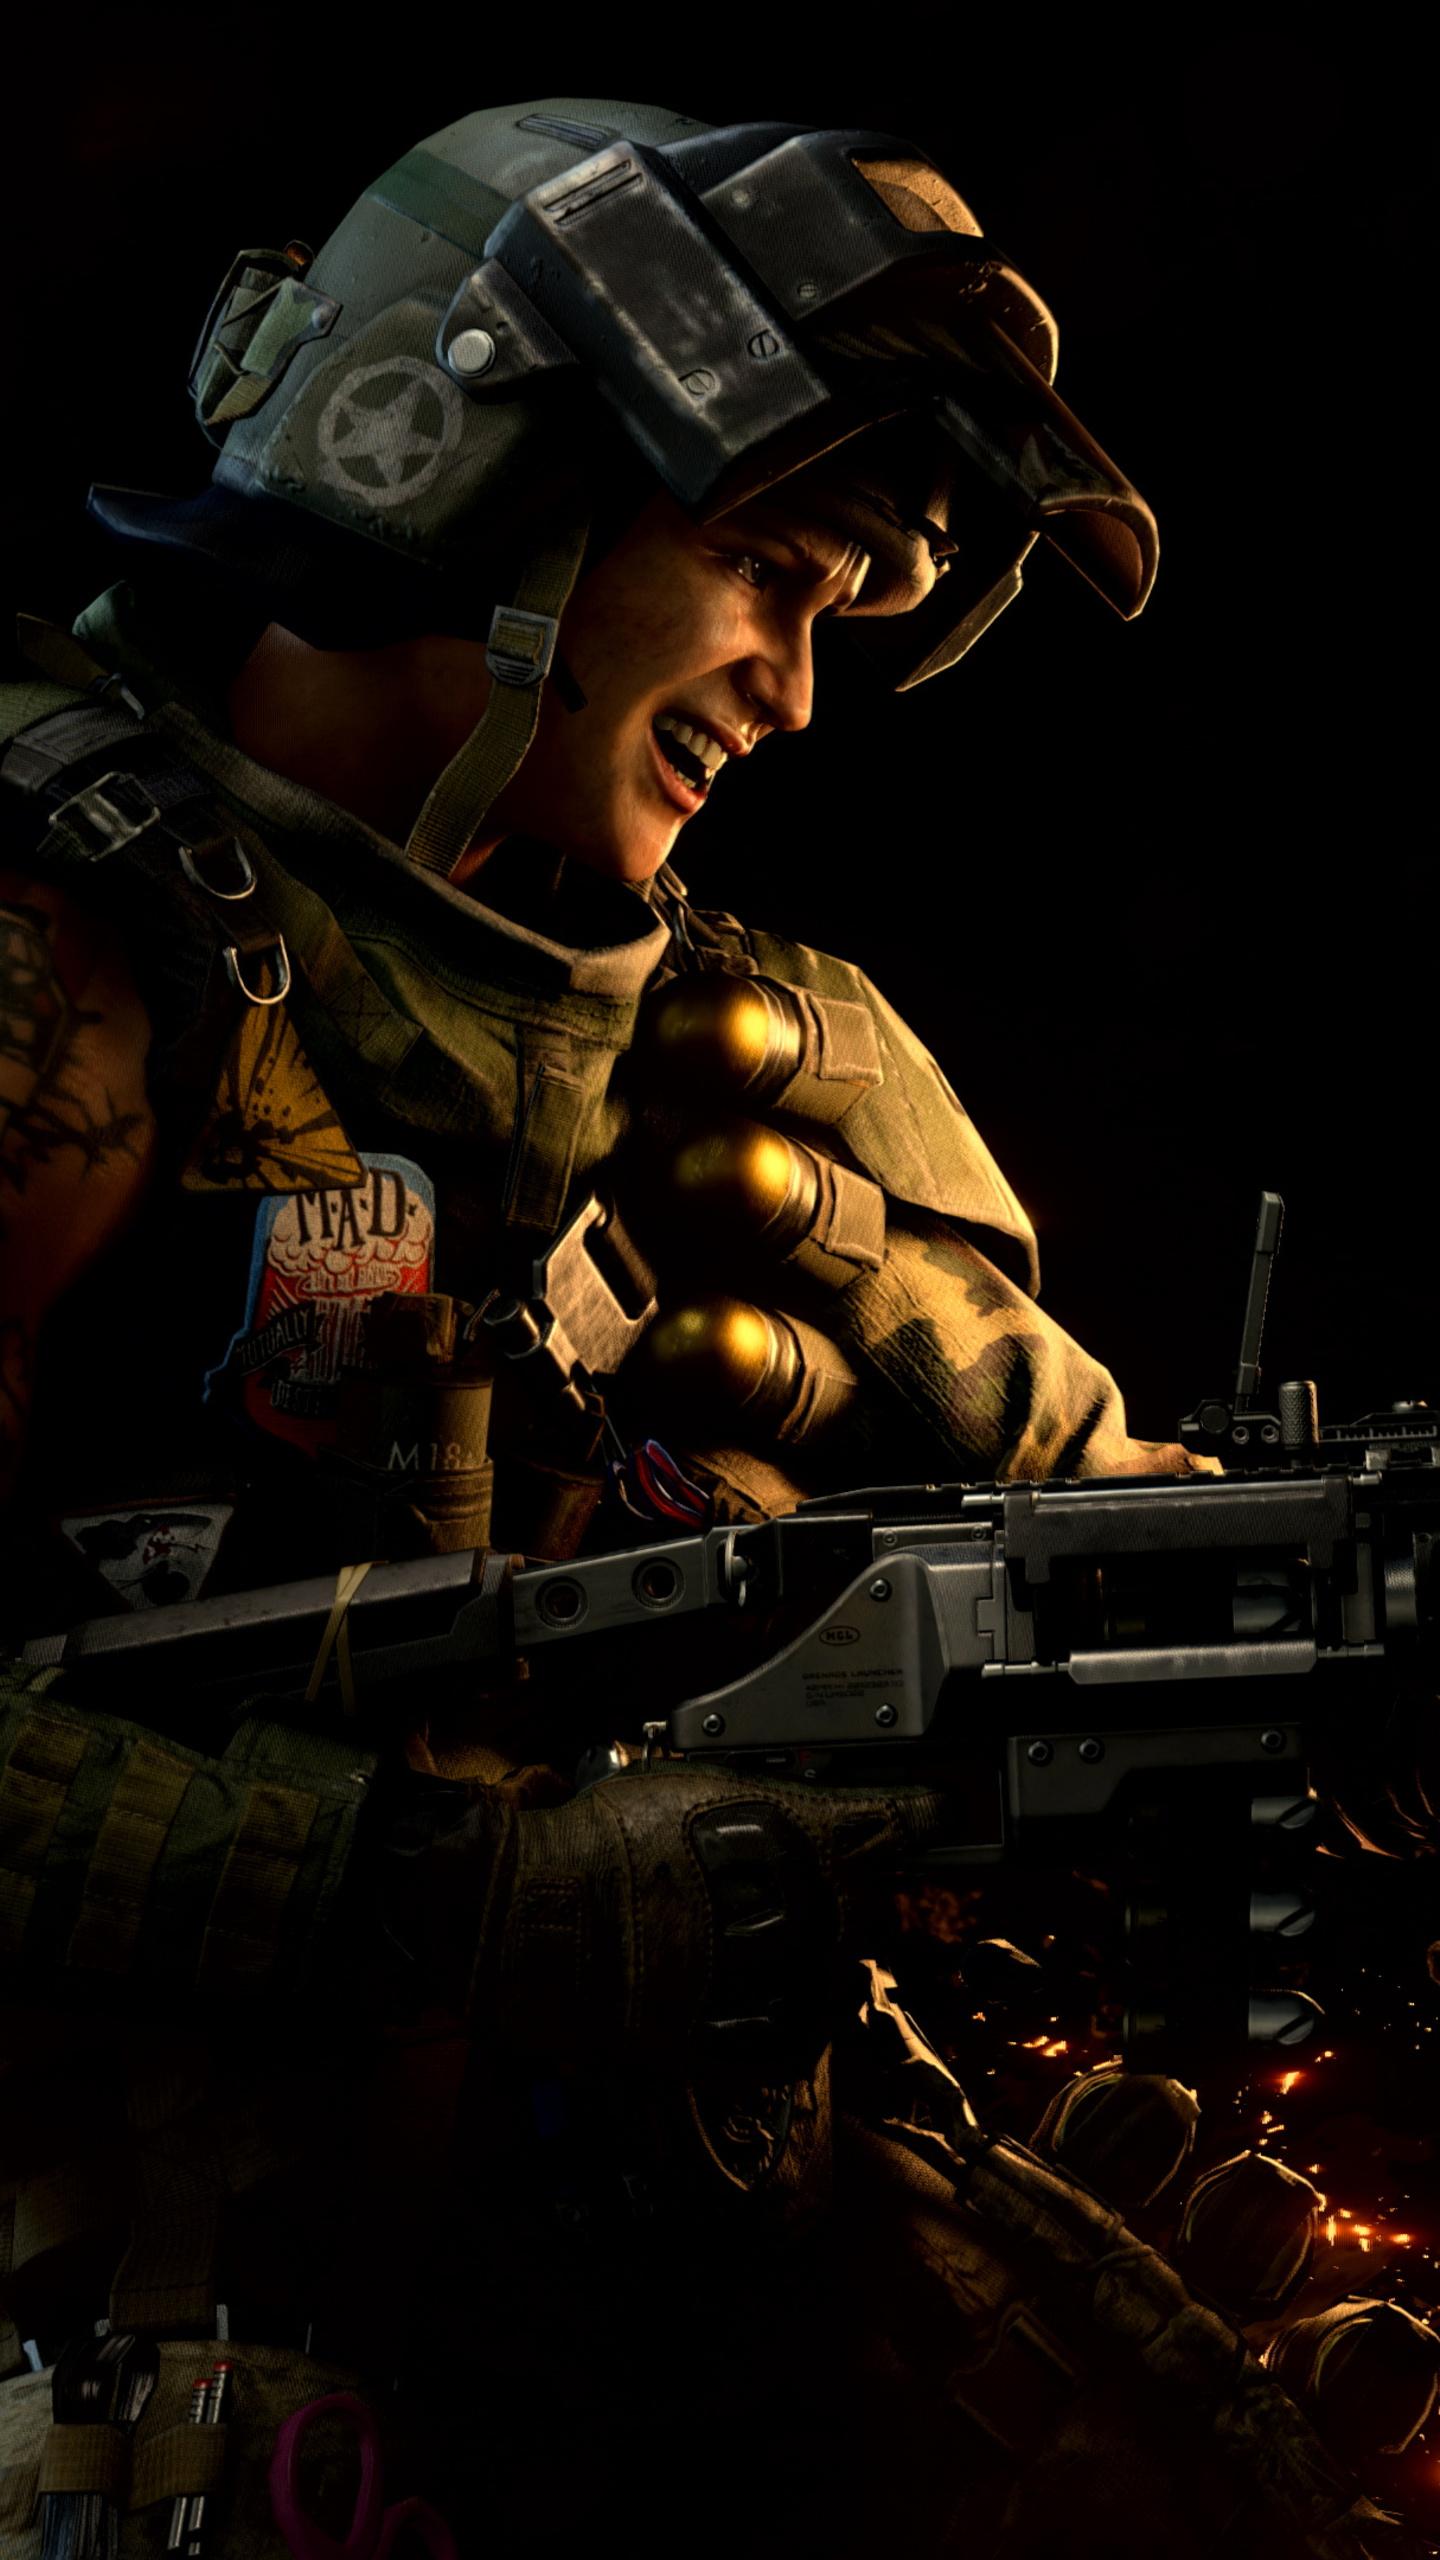 1440x2560 Call Of Duty Black Ops 4 4k Samsung Galaxy S6s7